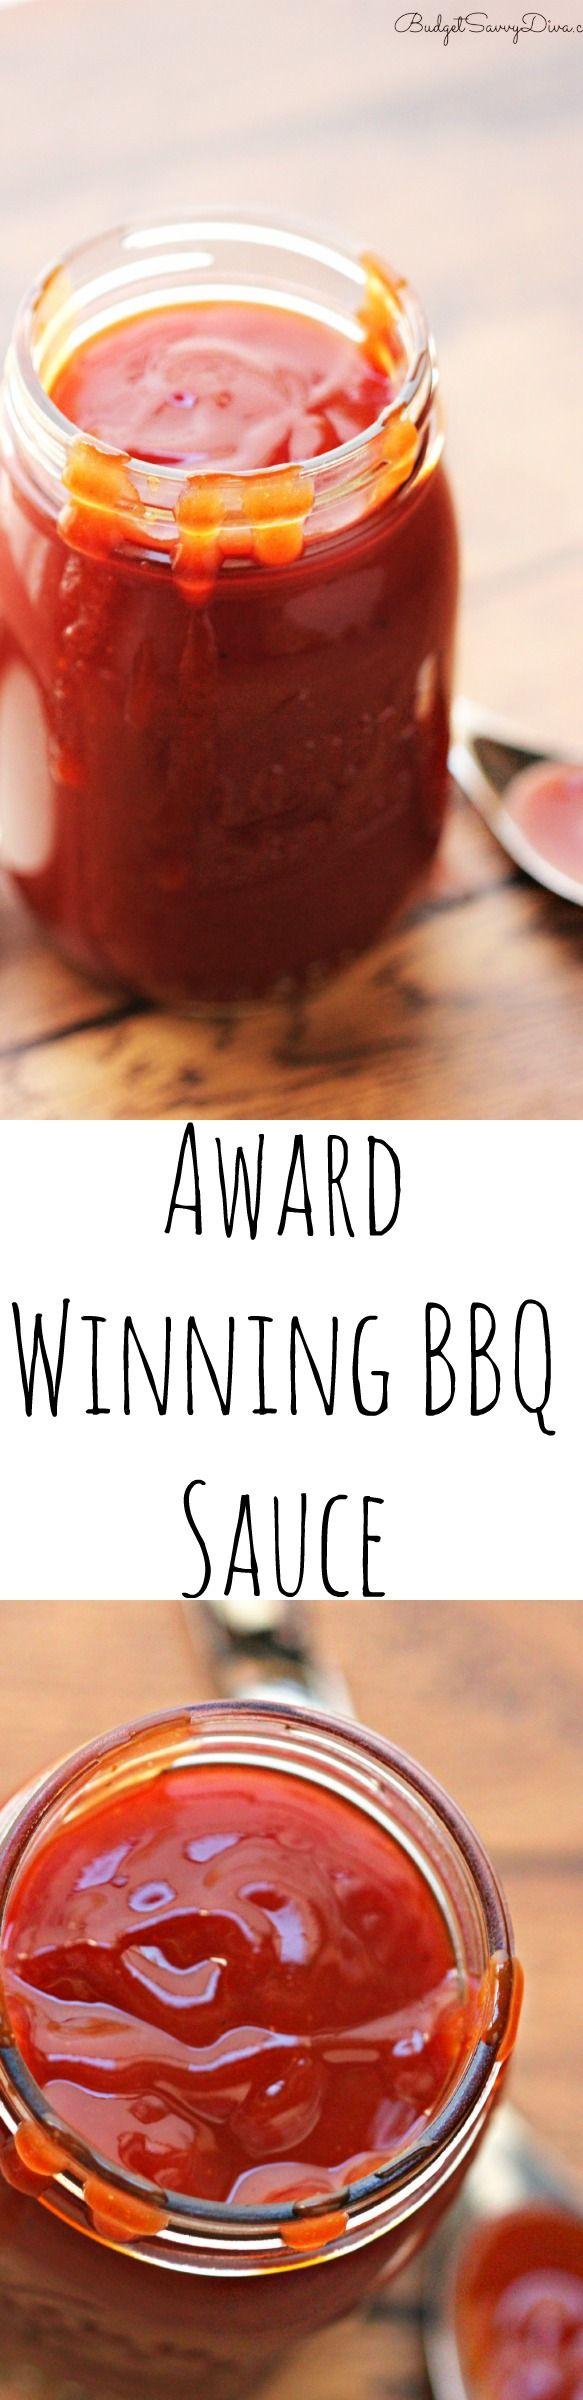 Award Winning BBQ Sauce Recipe Homemade bbq sauce